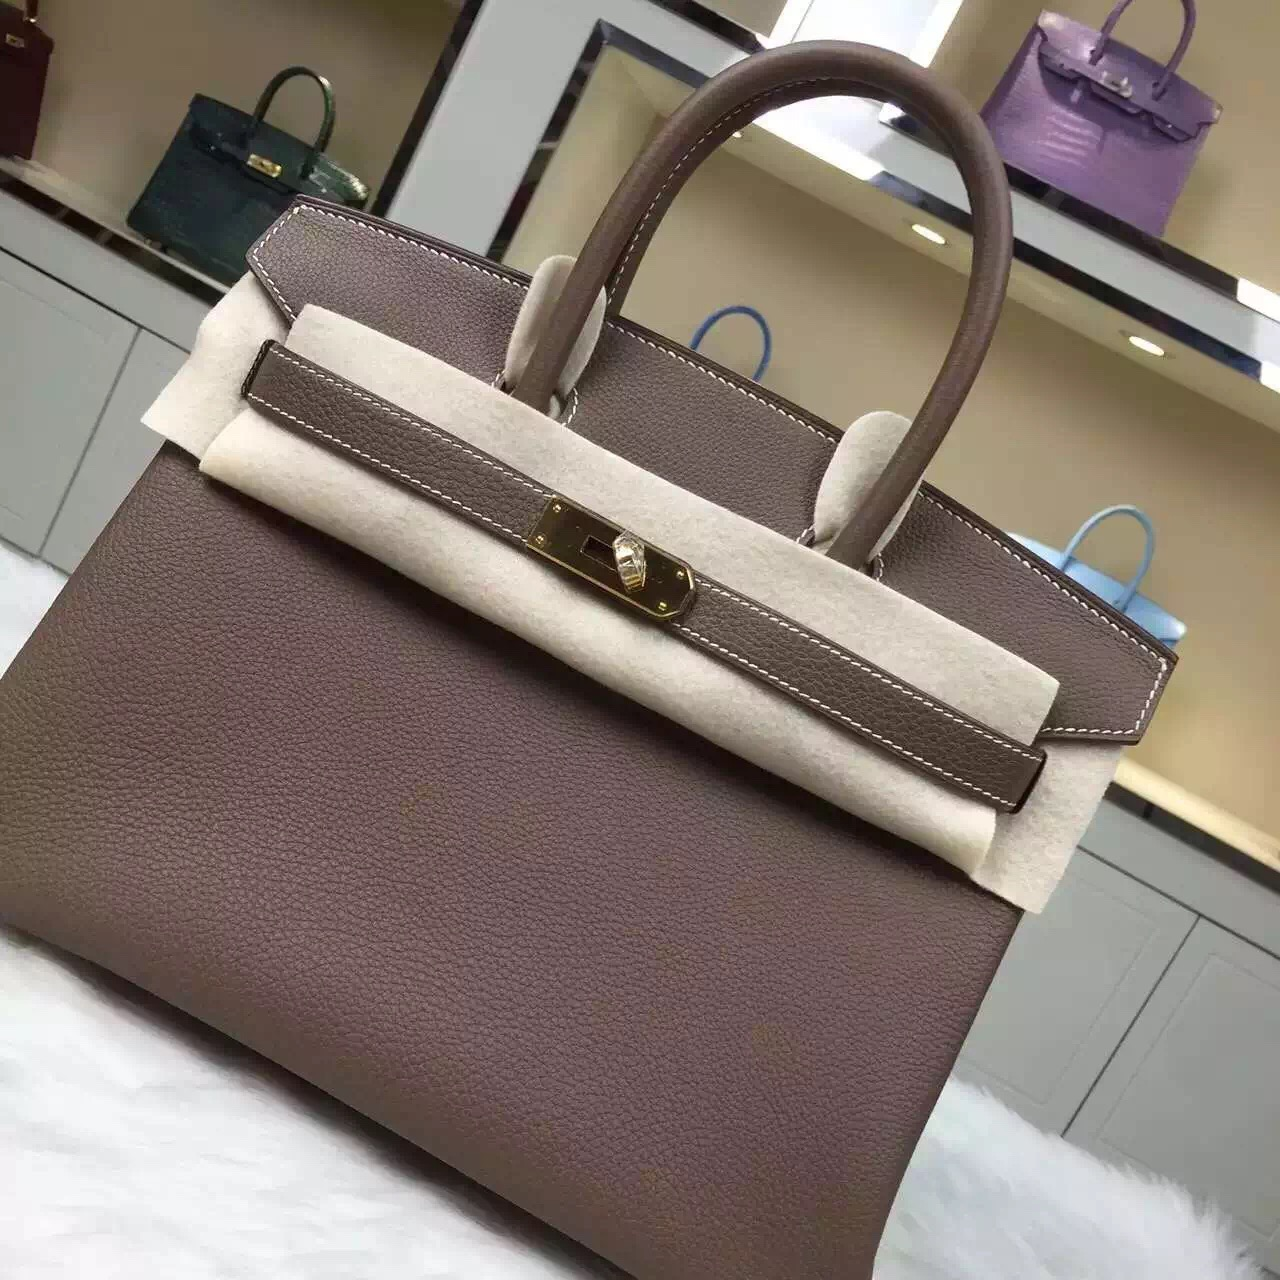 Hot Sale Hermes C8 Etoupe Grey Original Togo Leather Birkin Bag 30CM